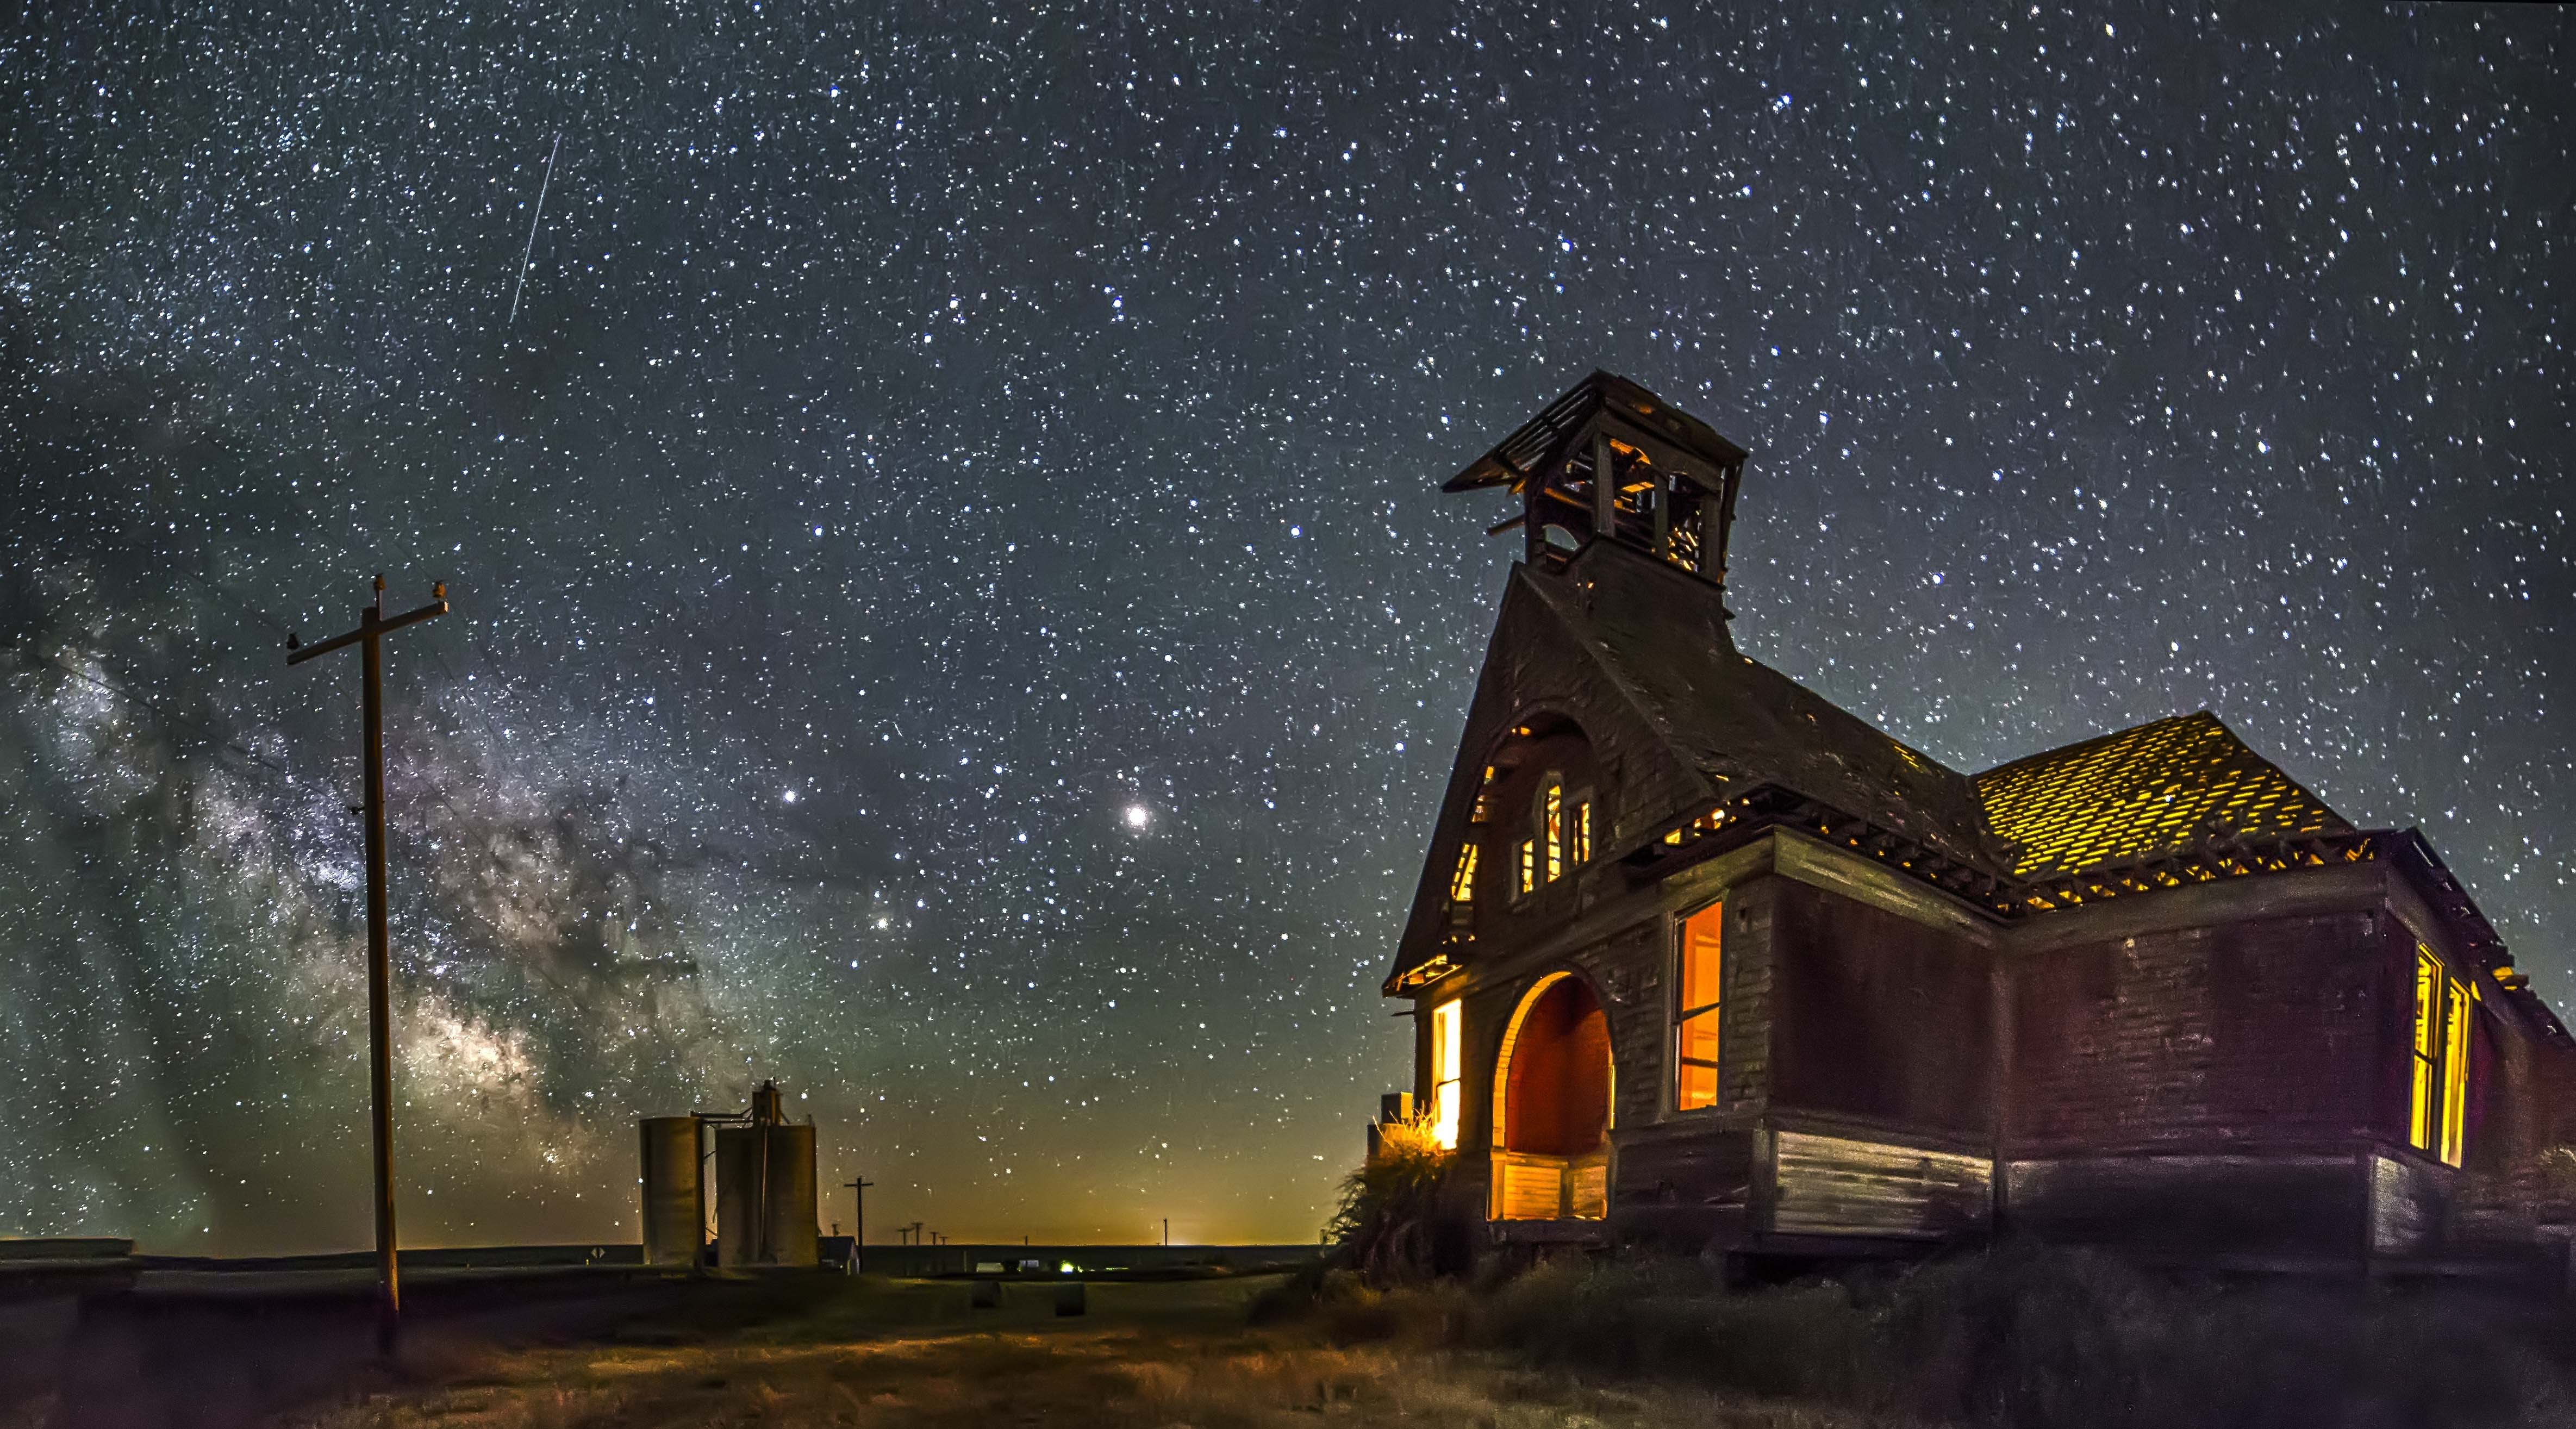 Govan Schoolhouse, Wilbur, Washington | North Western Images - photos by  Andy Porter